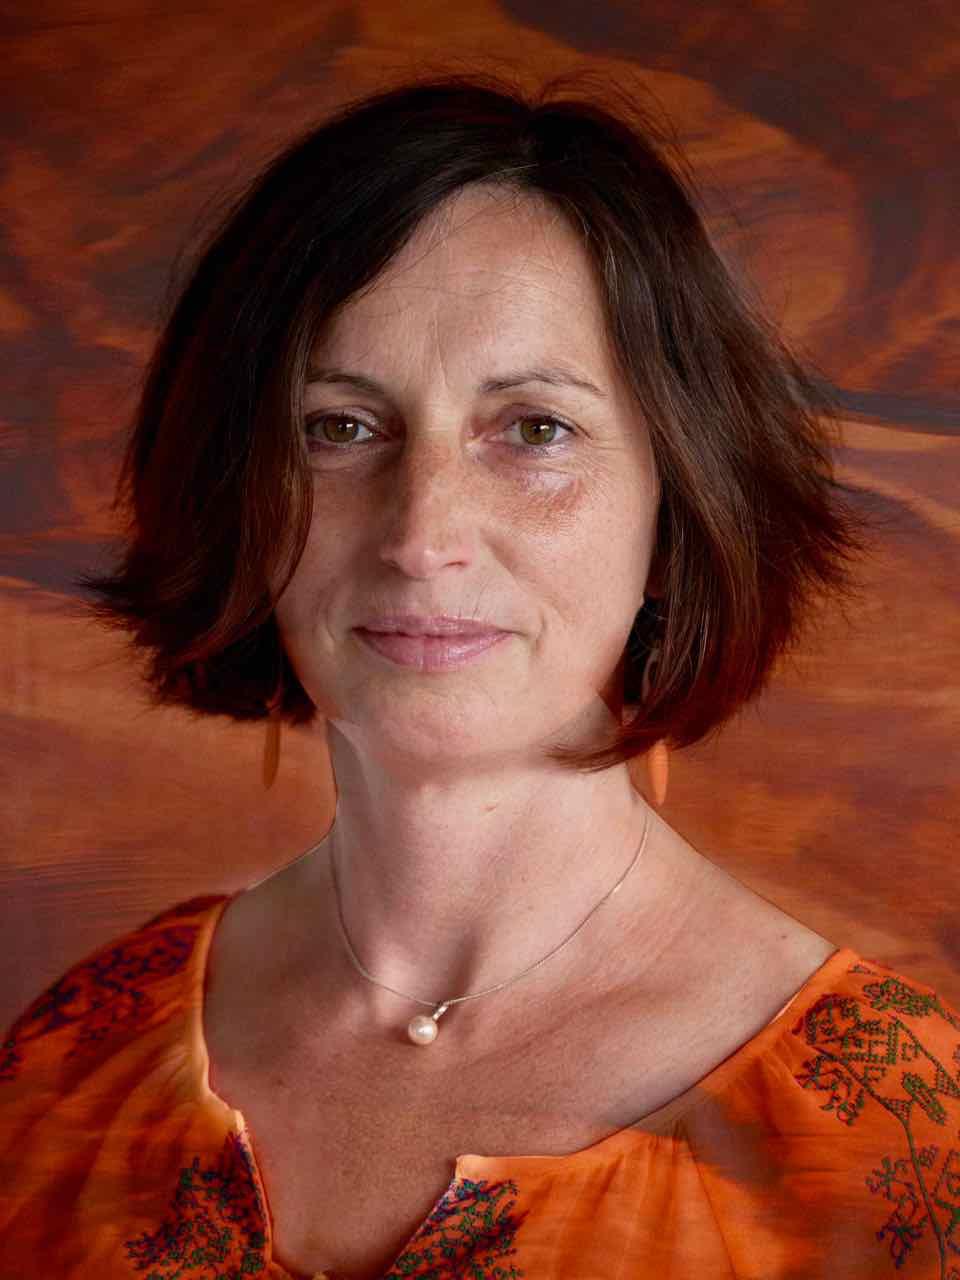 kraniosakralterapi ayouveda Cornelia Reinholz i helhedsHUSET på Tåsinge